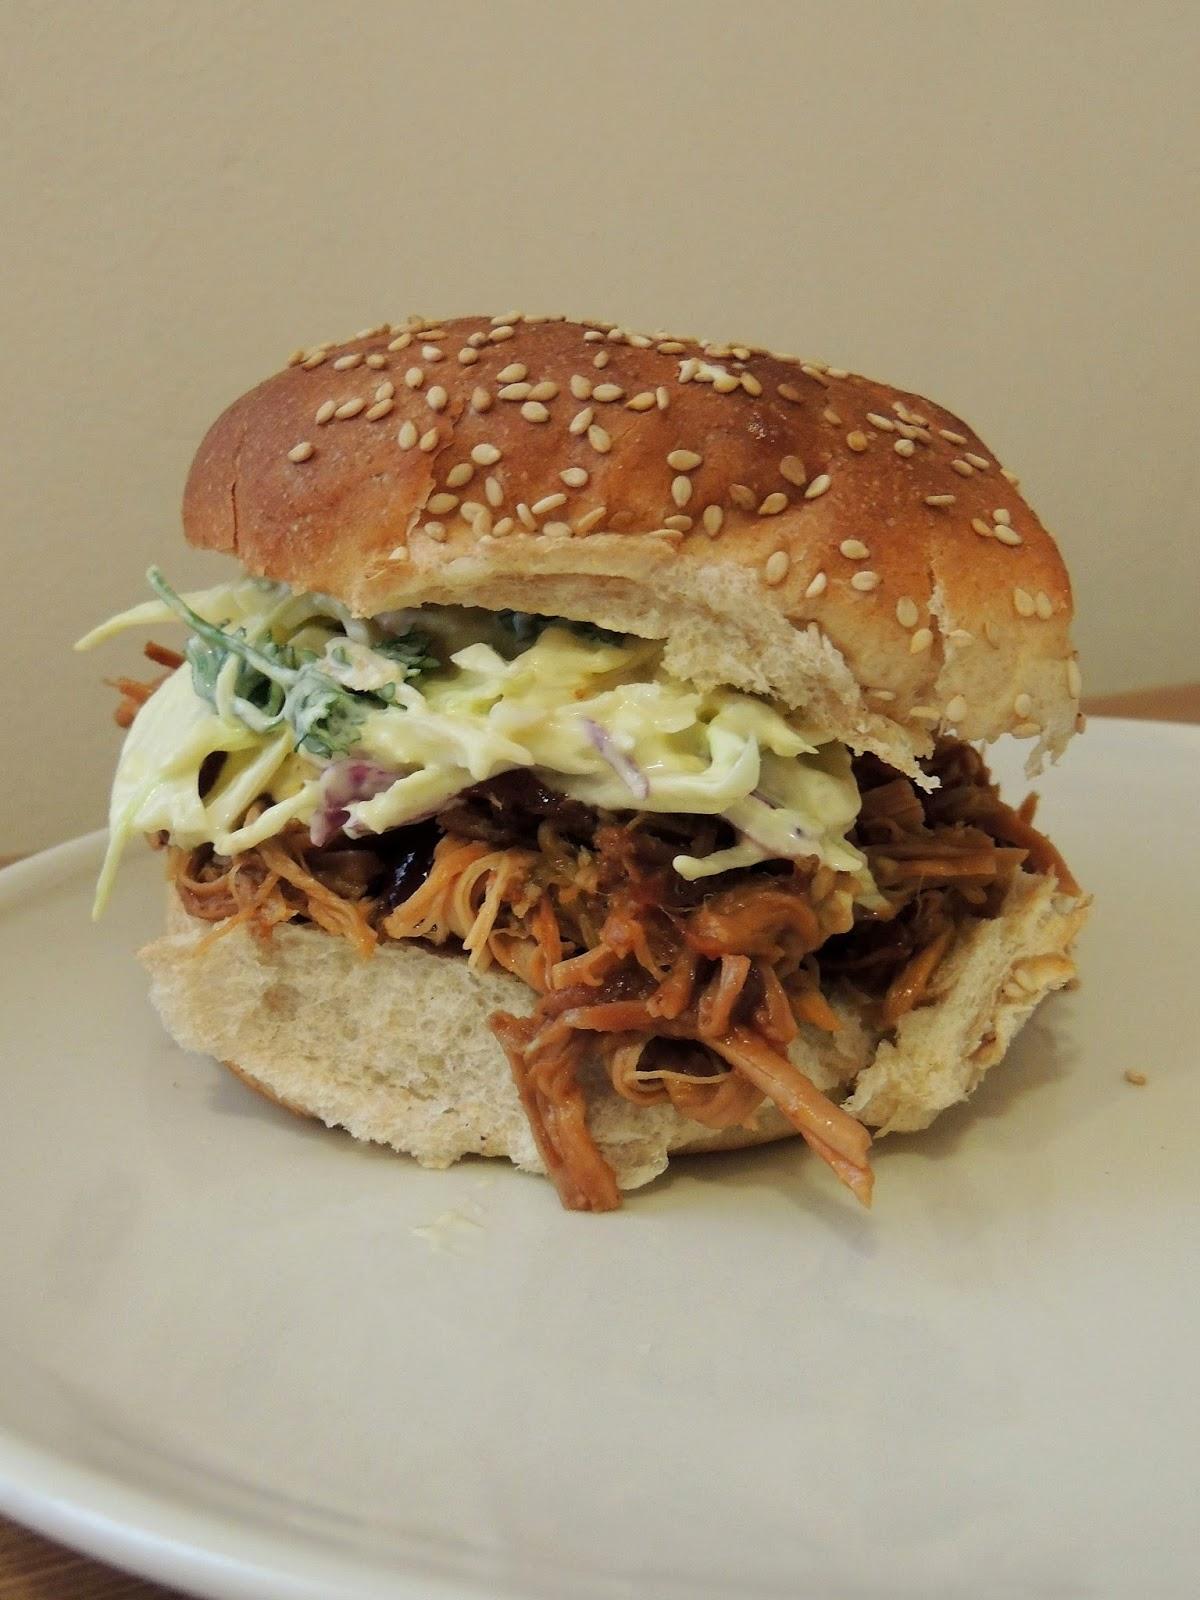 Gas Stove Girl: Dr. Pepper Crock-Pot Pulled Pork Sandwiches